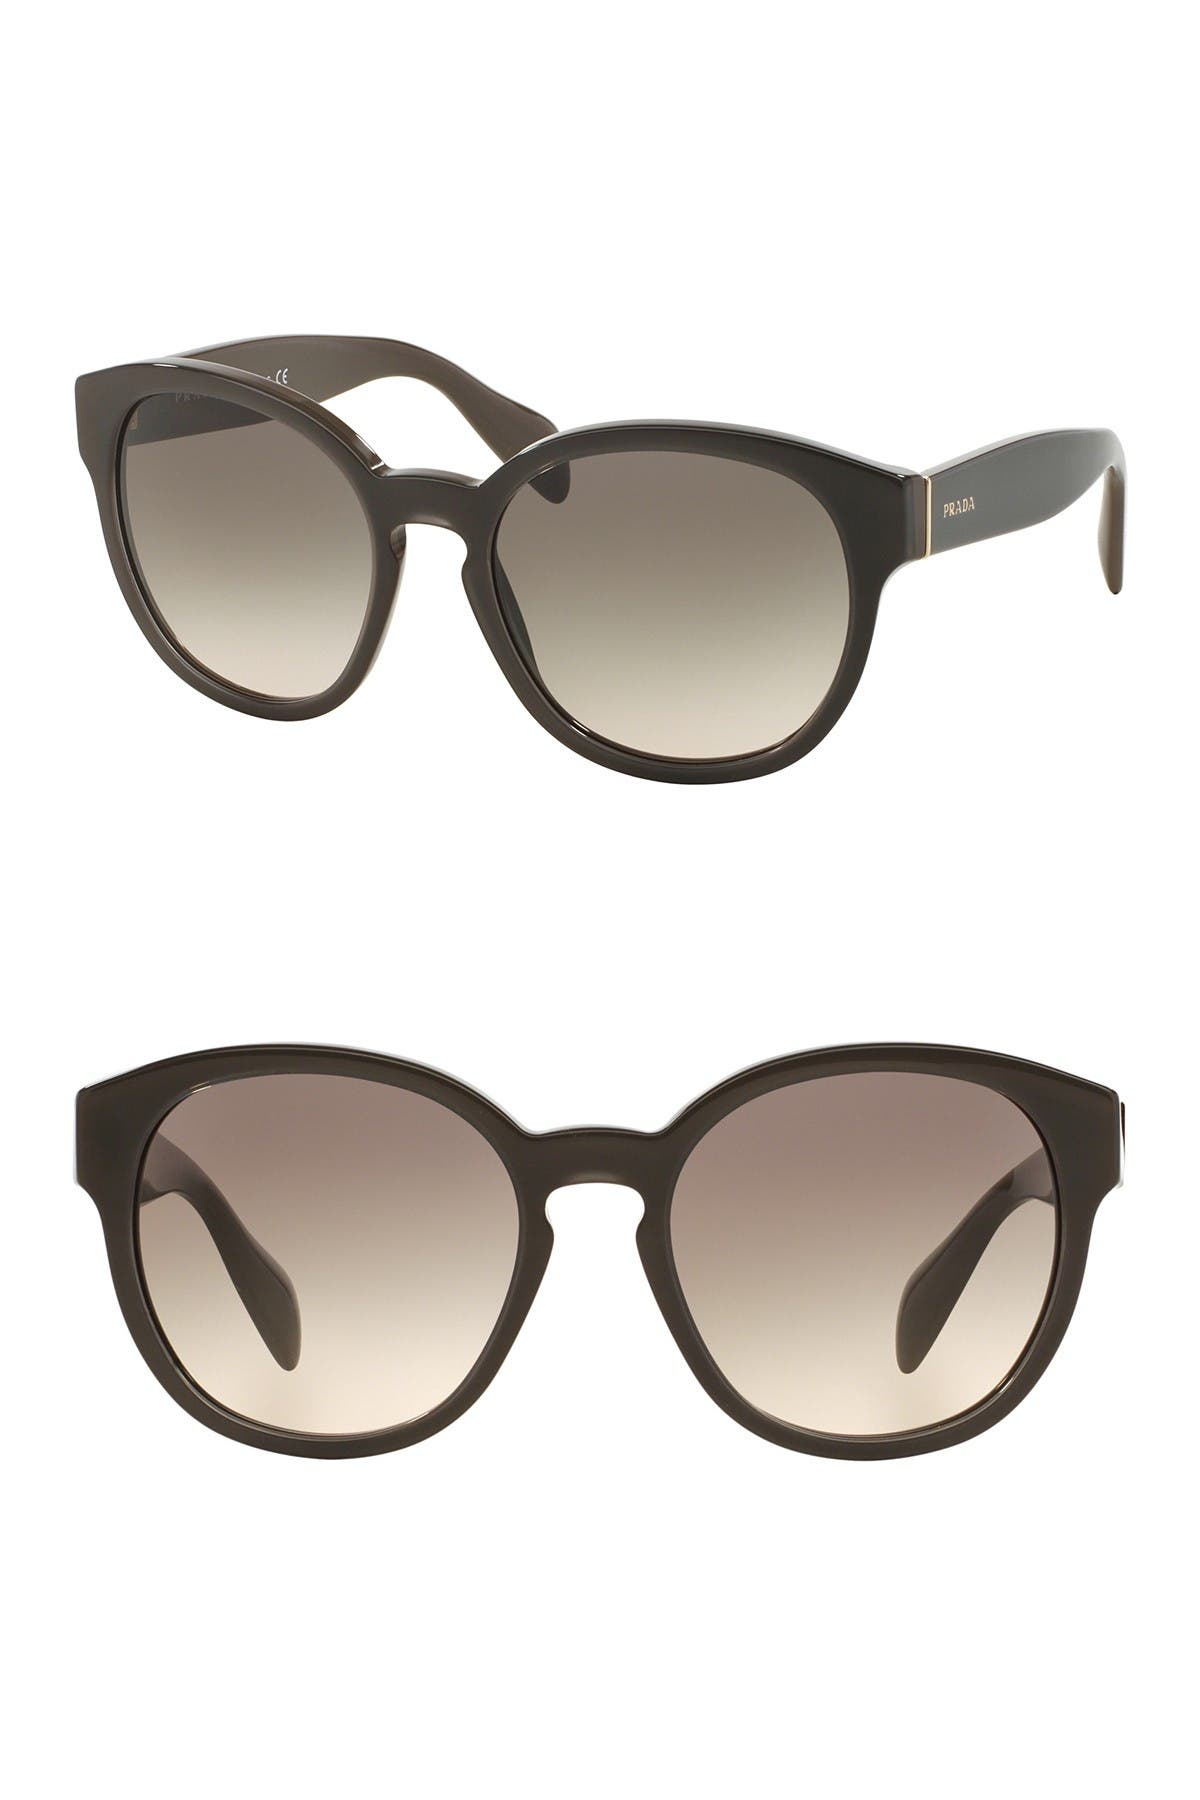 Image of Prada 56mm Round Sunglasses